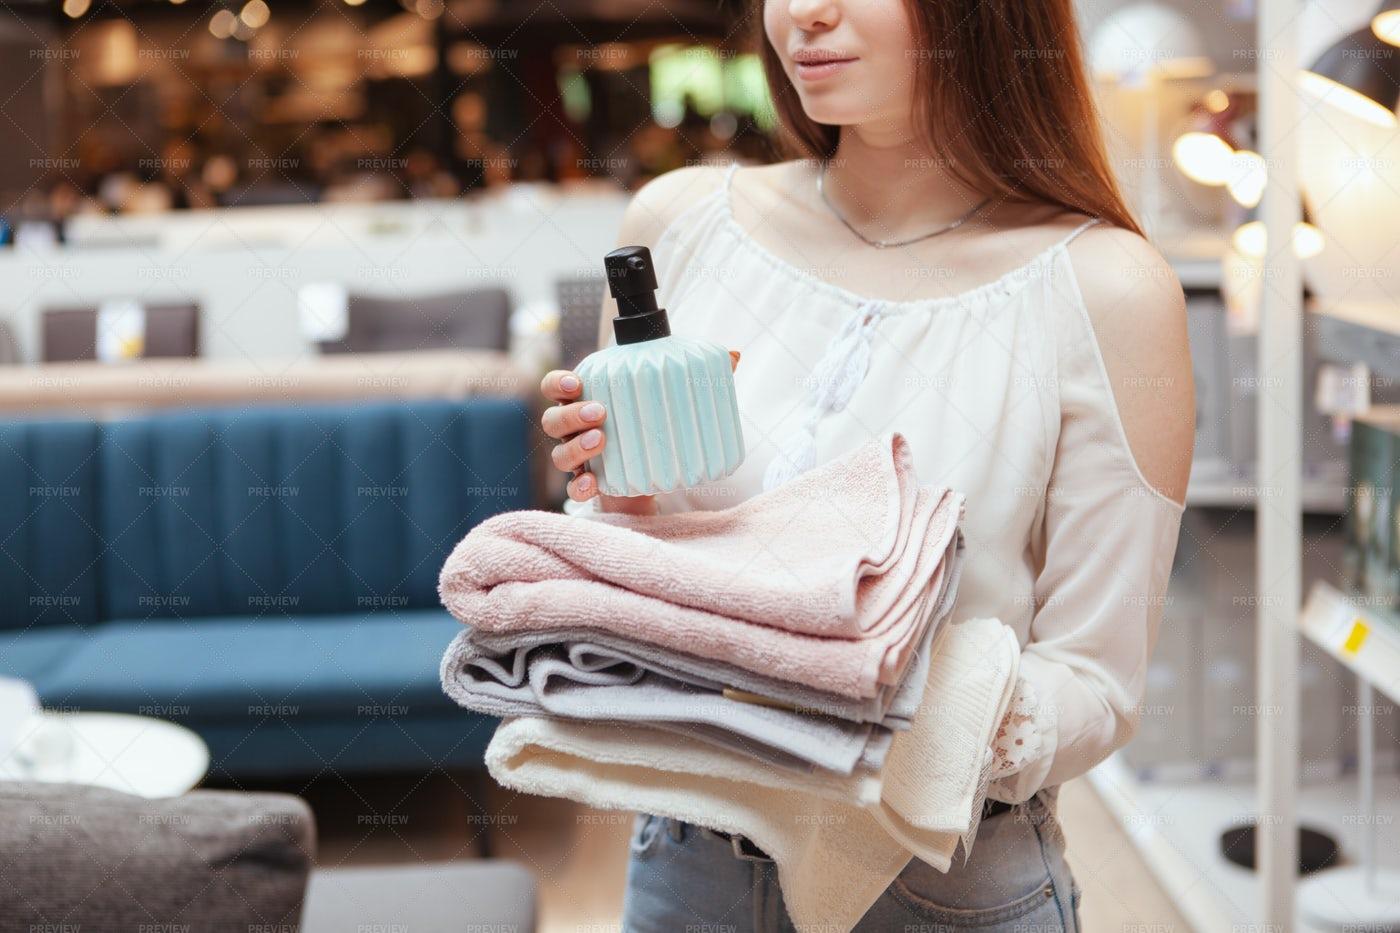 Shopping For Bathroom Items: Stock Photos